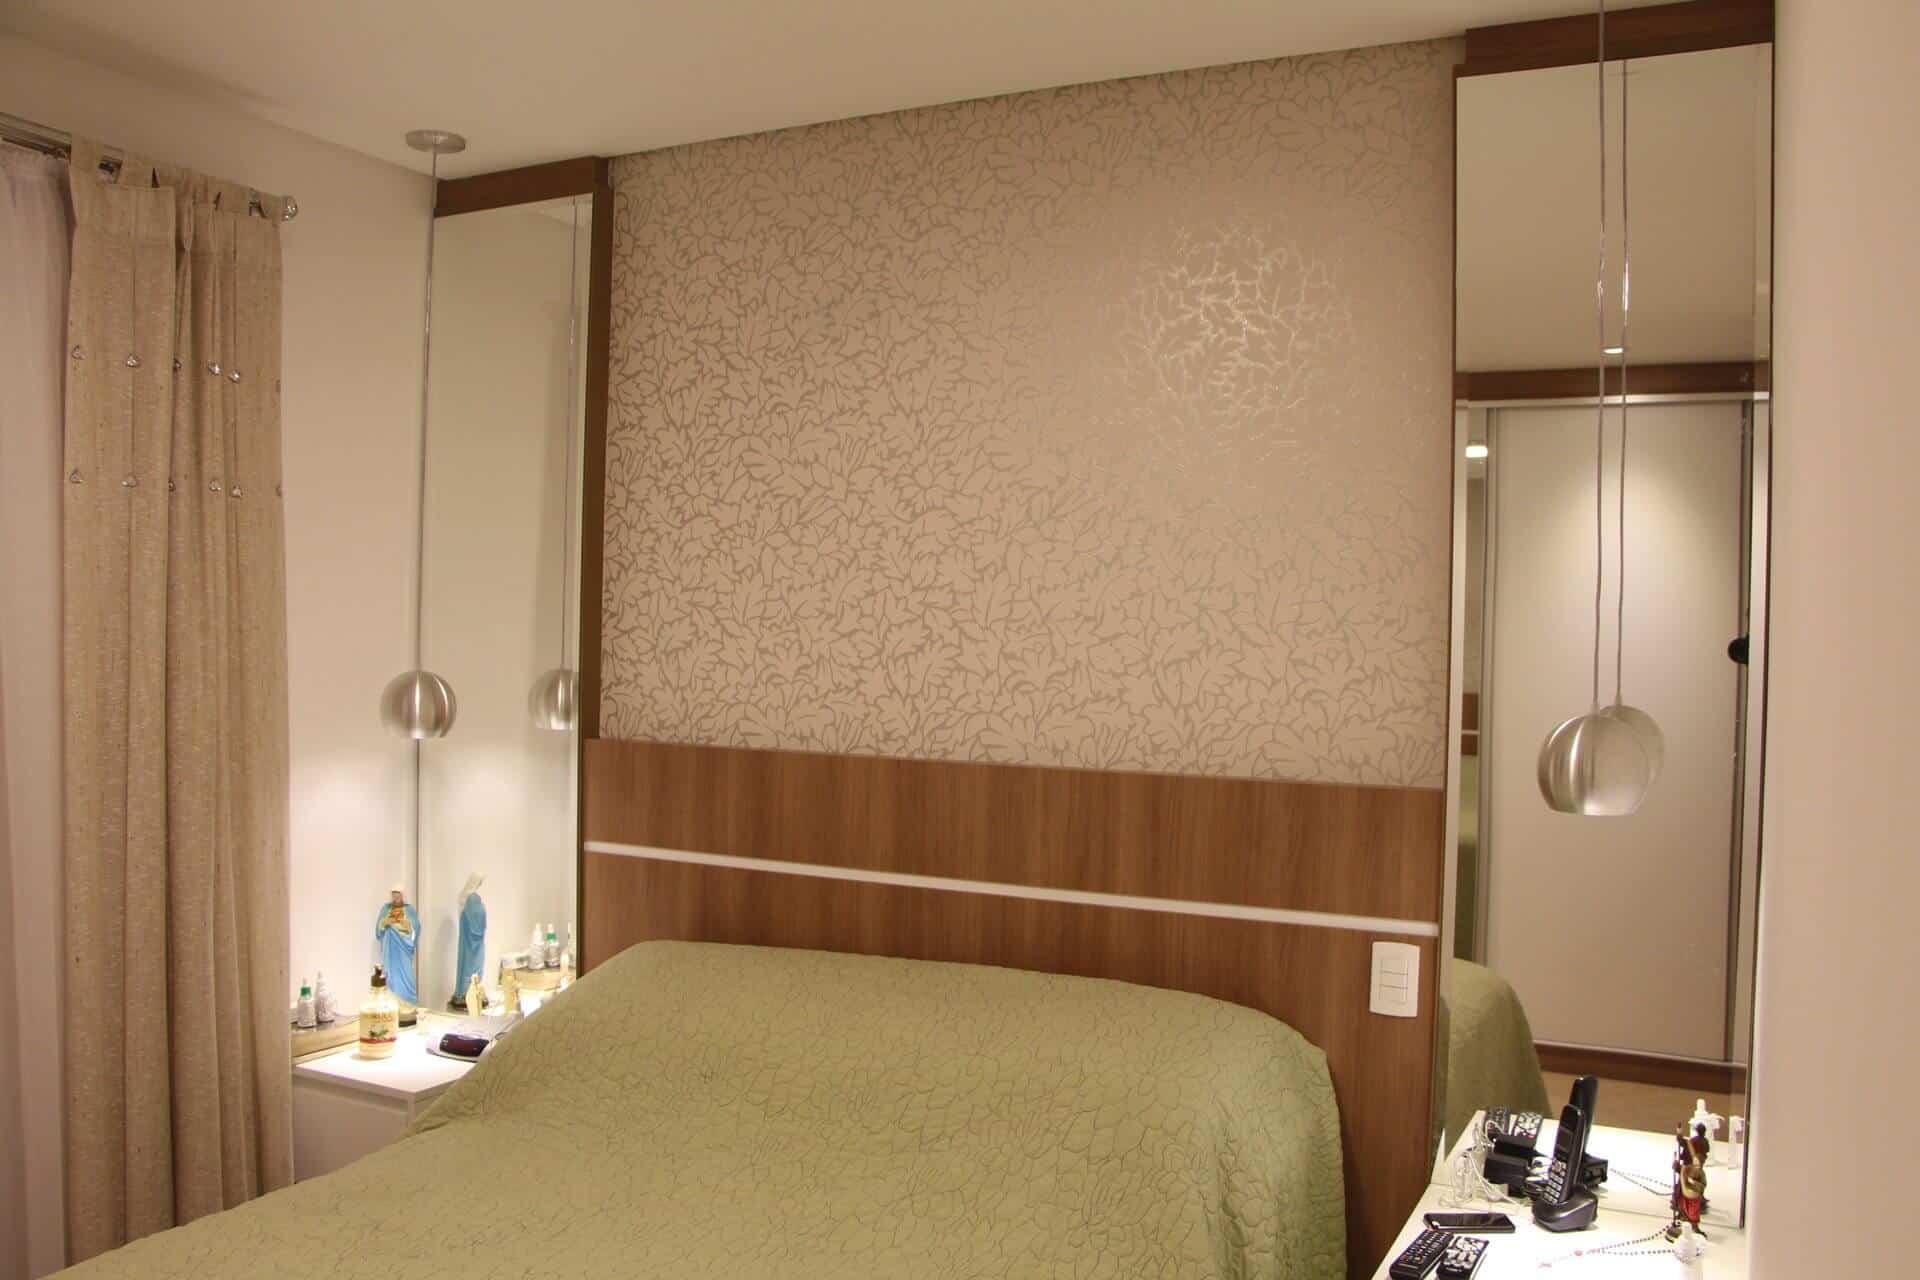 dormitorio-planejado_moveis-sob-medida-galeria-121